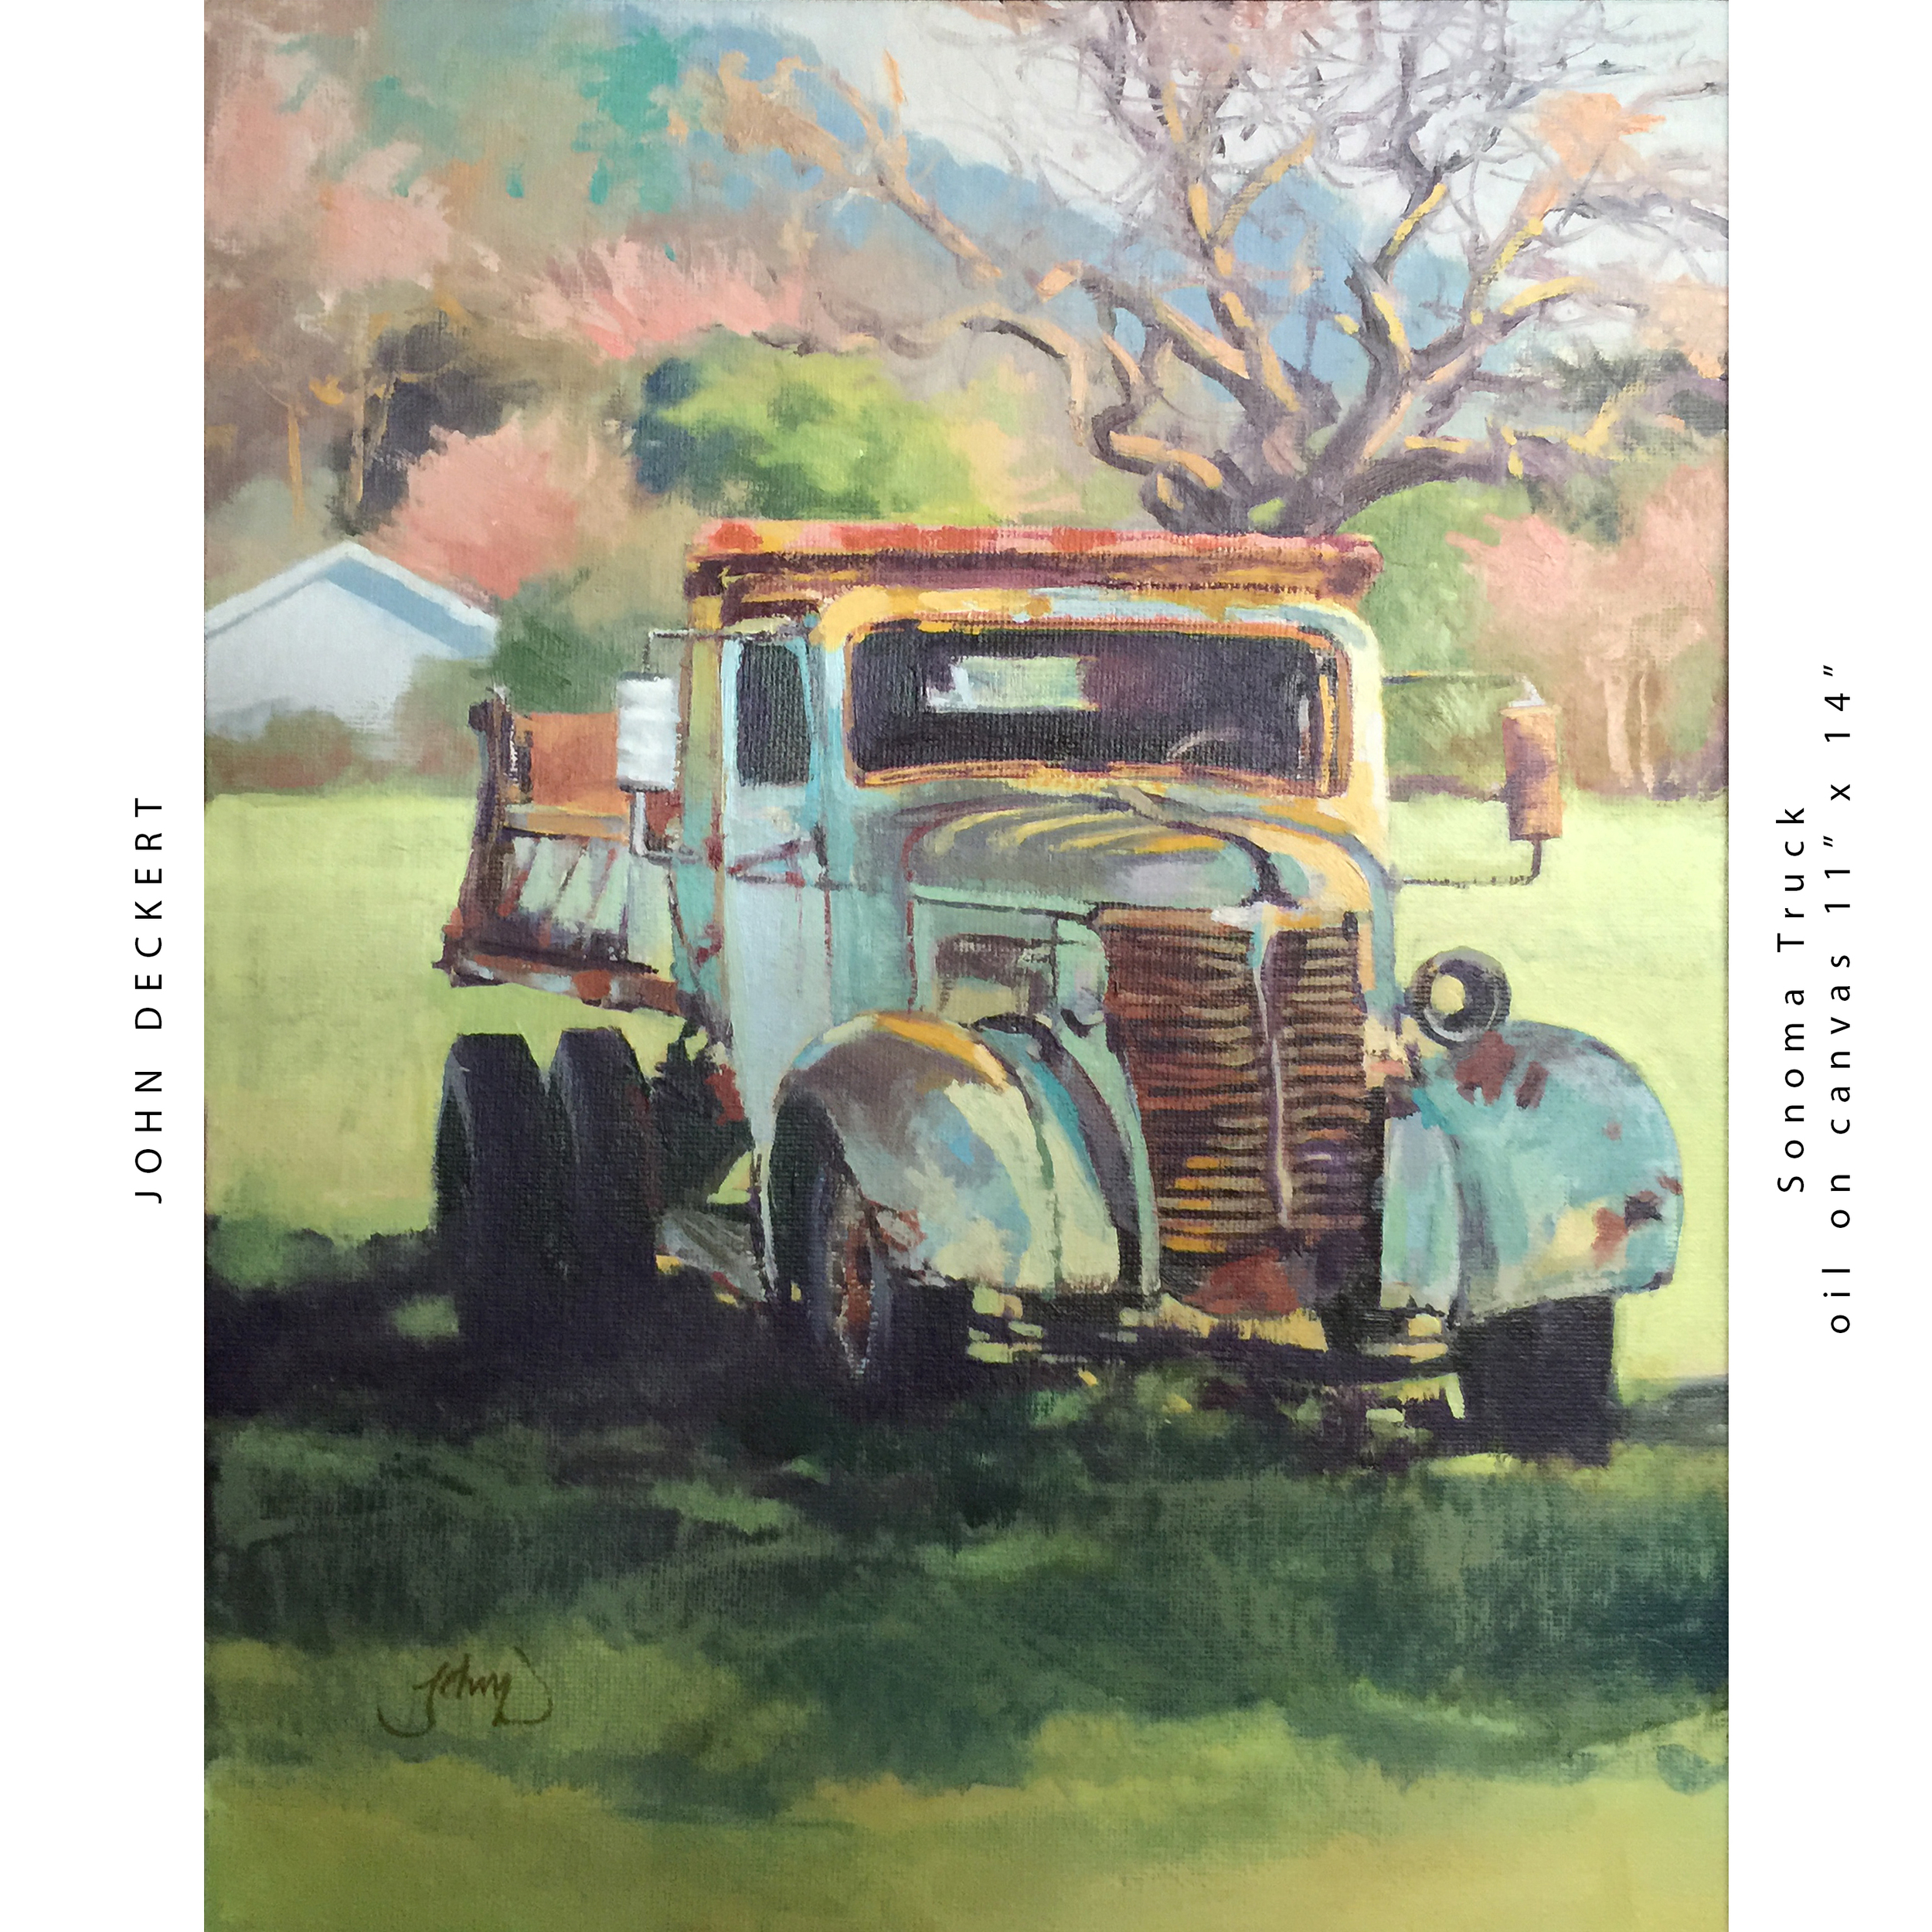 Sonoma Truck